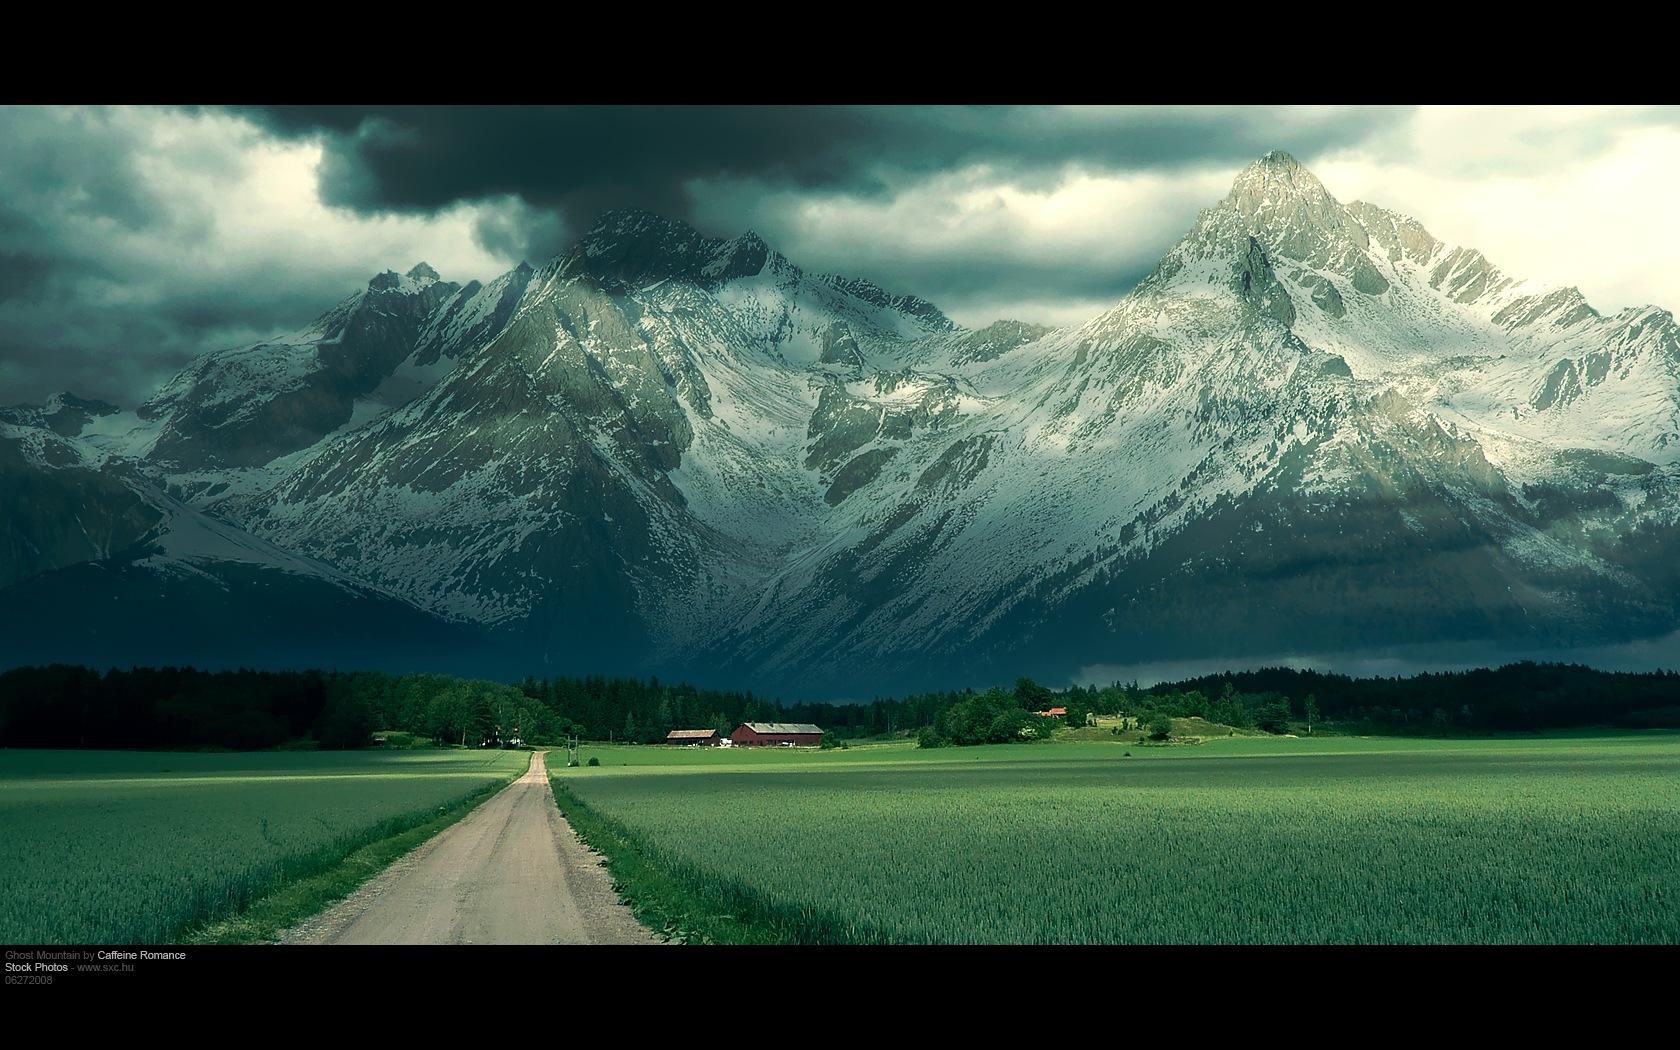 Download Wallpaper Mountain Quote - aytgln  Image_479285.jpg